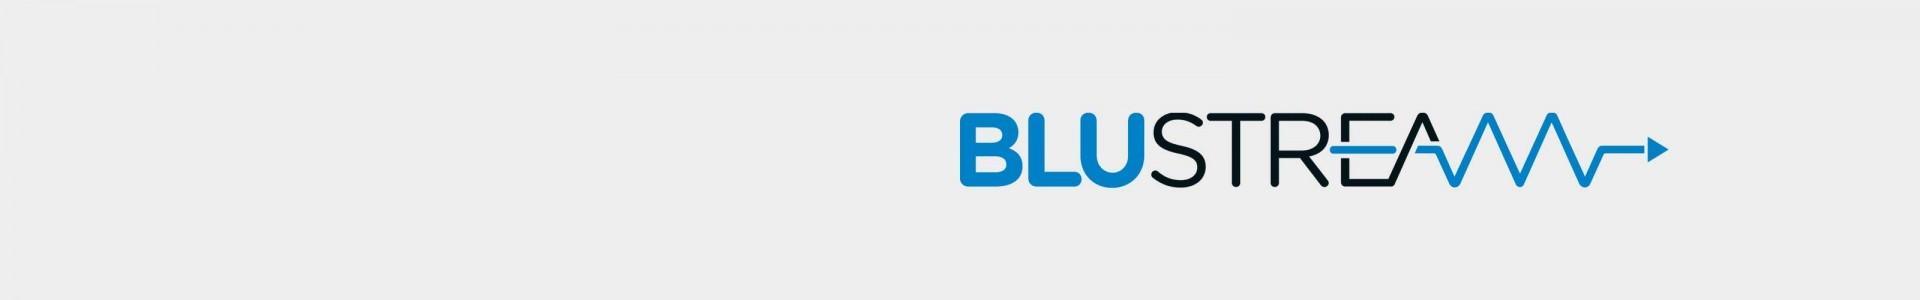 Blustream HDMI Splitters at Avacab Audiovisuales